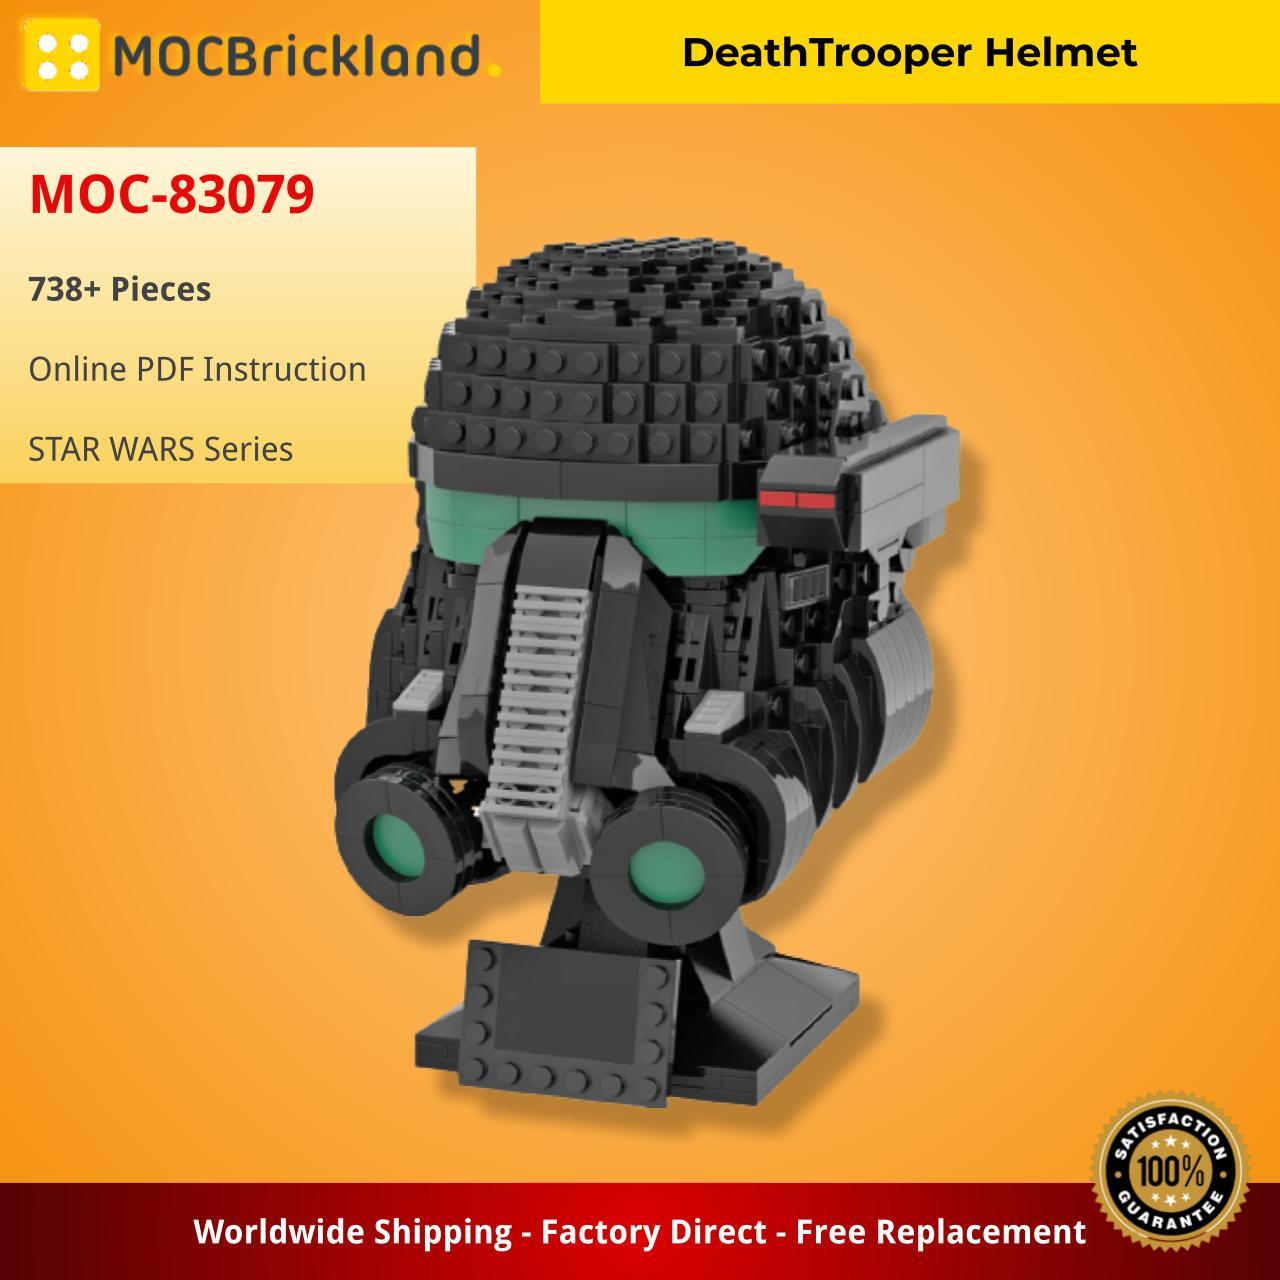 DeathTrooper Helmet STAR WARS MOC-83079 by Albo.Lego WITH 738 PIECES